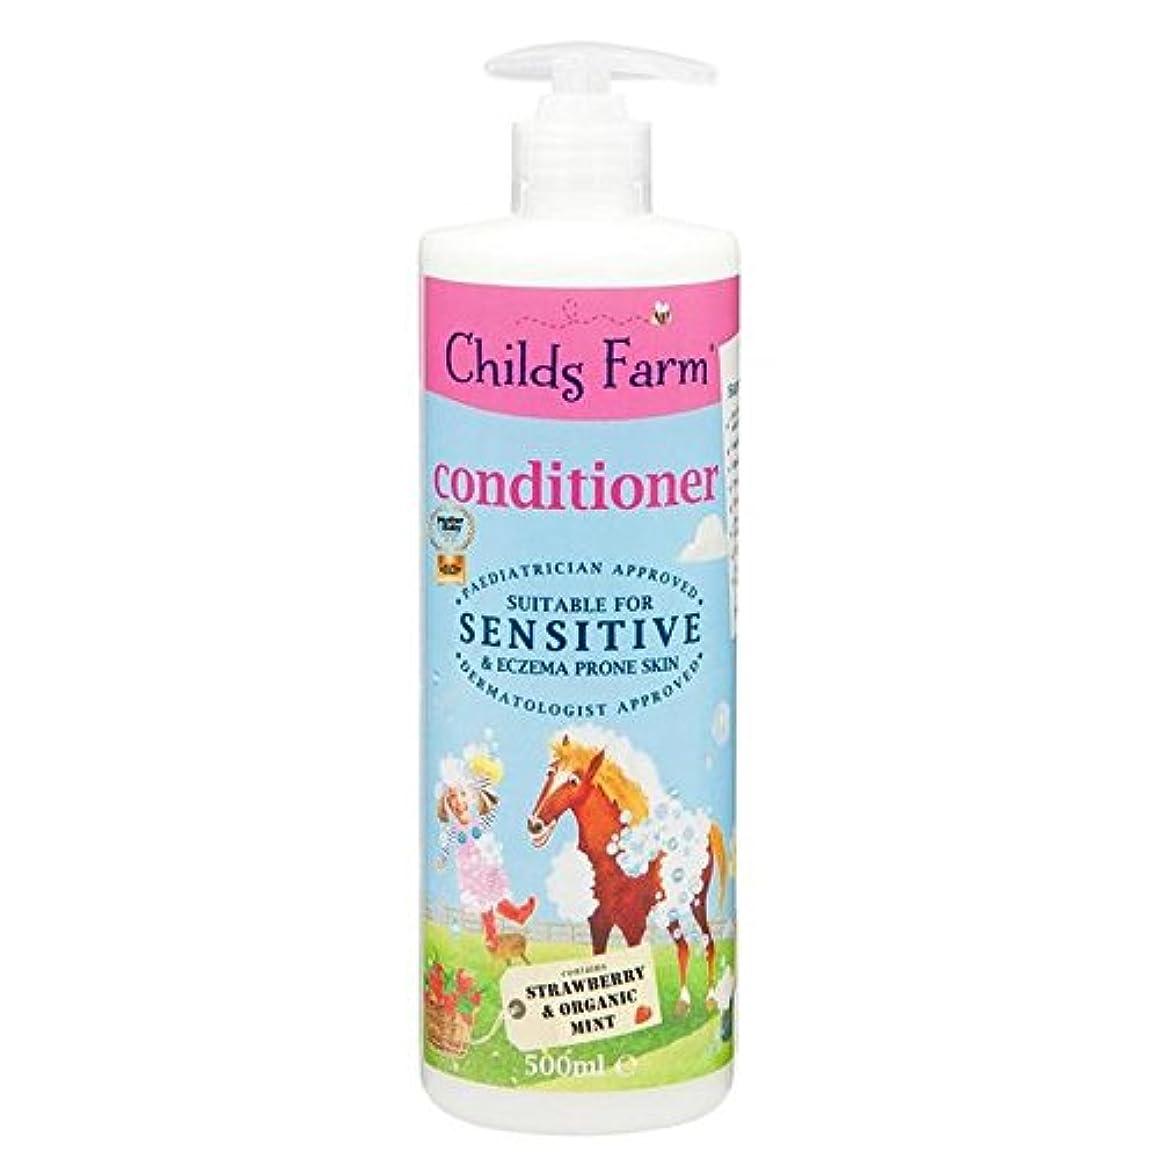 Childs Farm Conditioner for Unruly Hair 500ml - 手に負えない髪の500ミリリットルのためのチャイルズファームコンディショナー [並行輸入品]